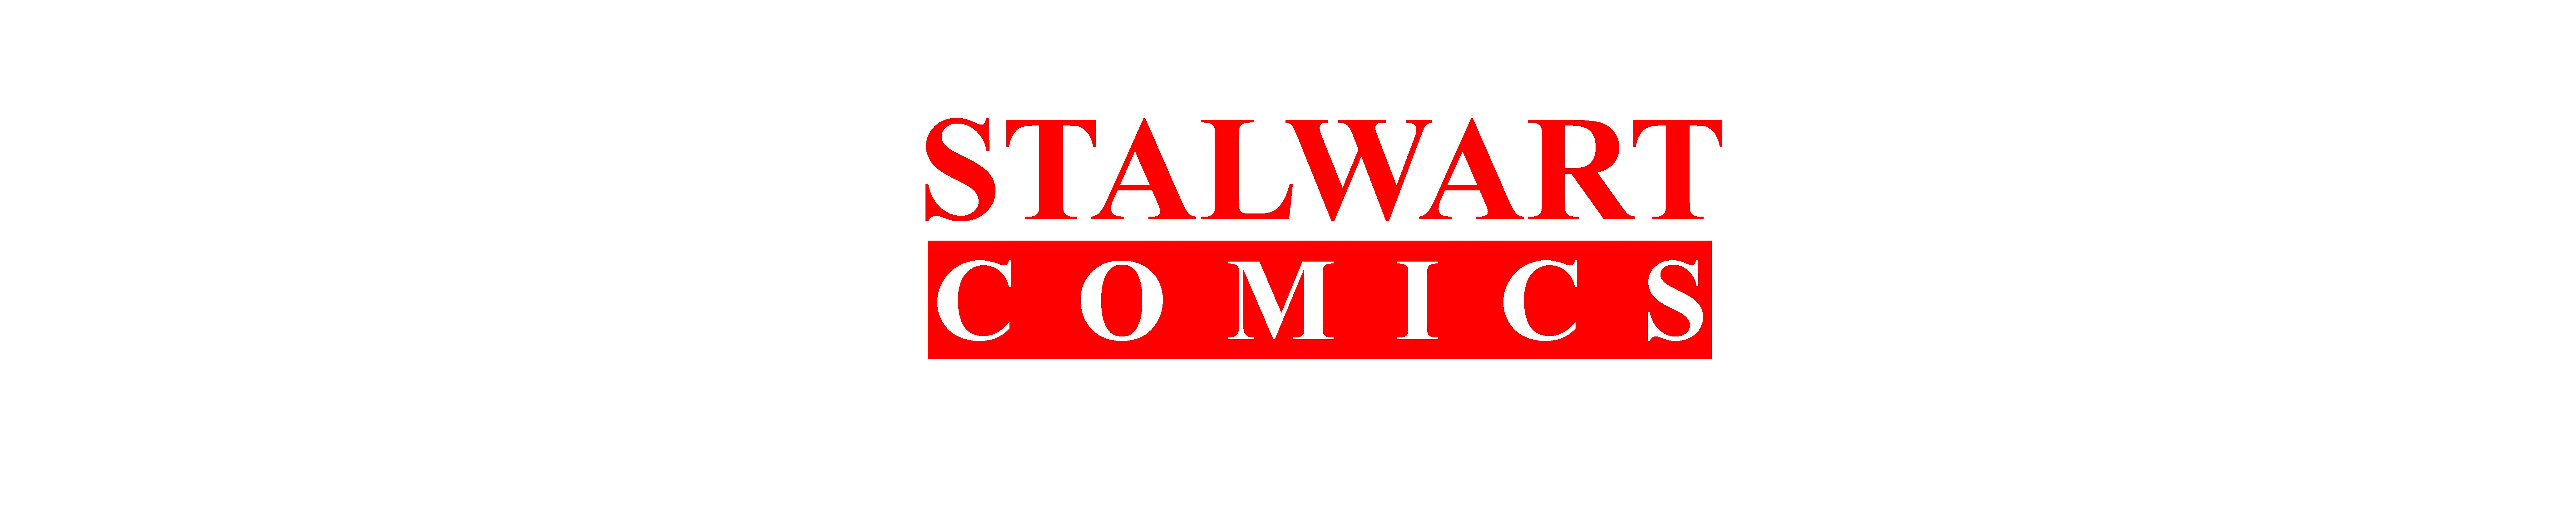 Stalwart Comics